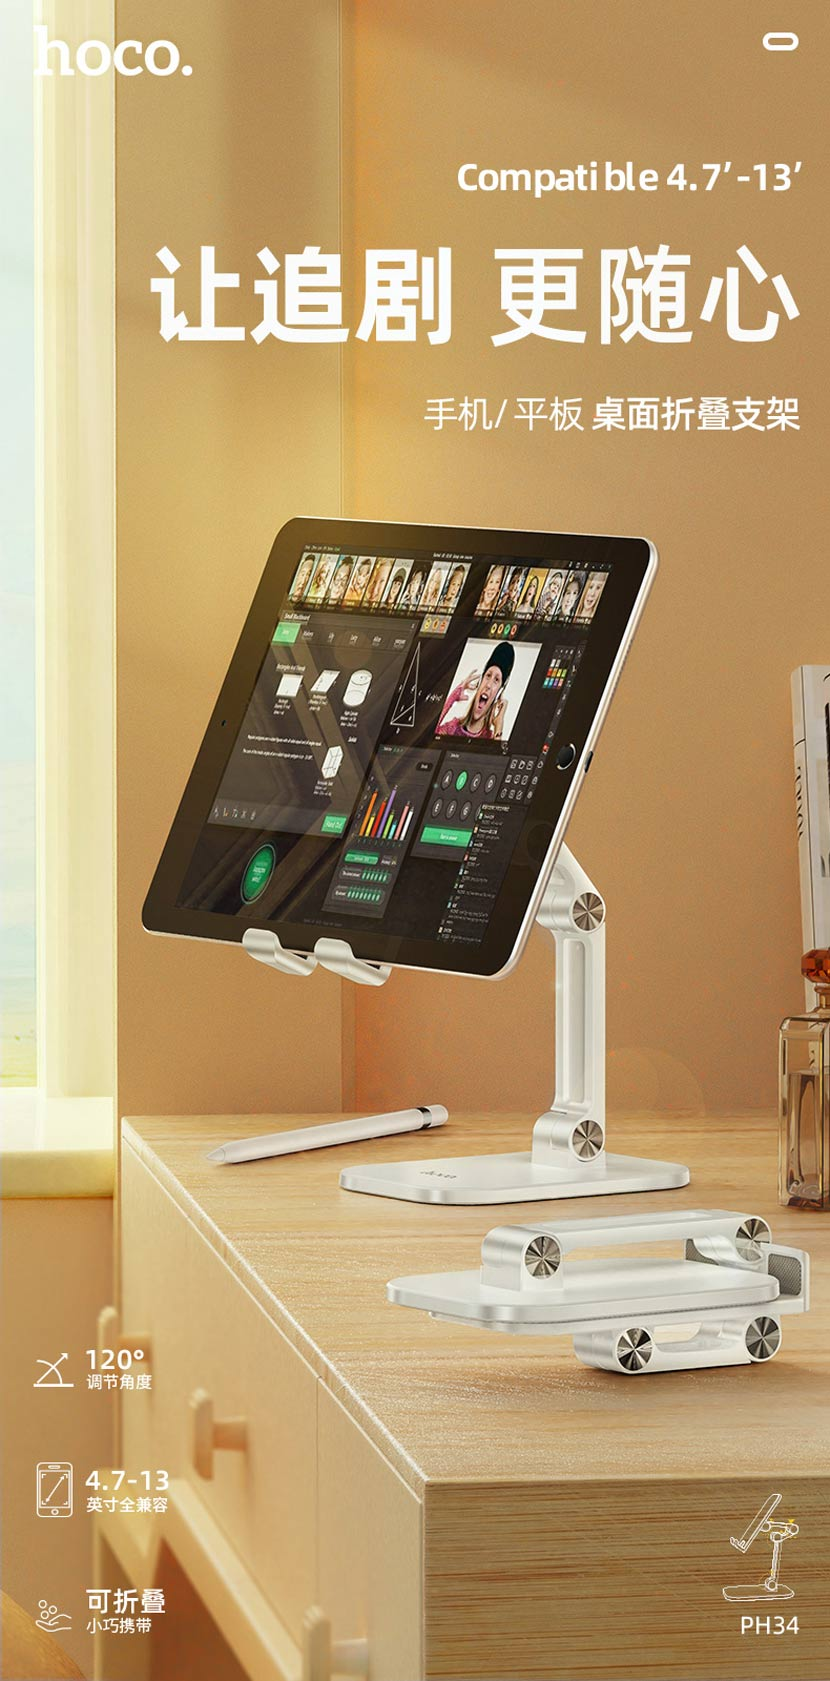 hoco news ph34 excelente double folding desktop stand cn